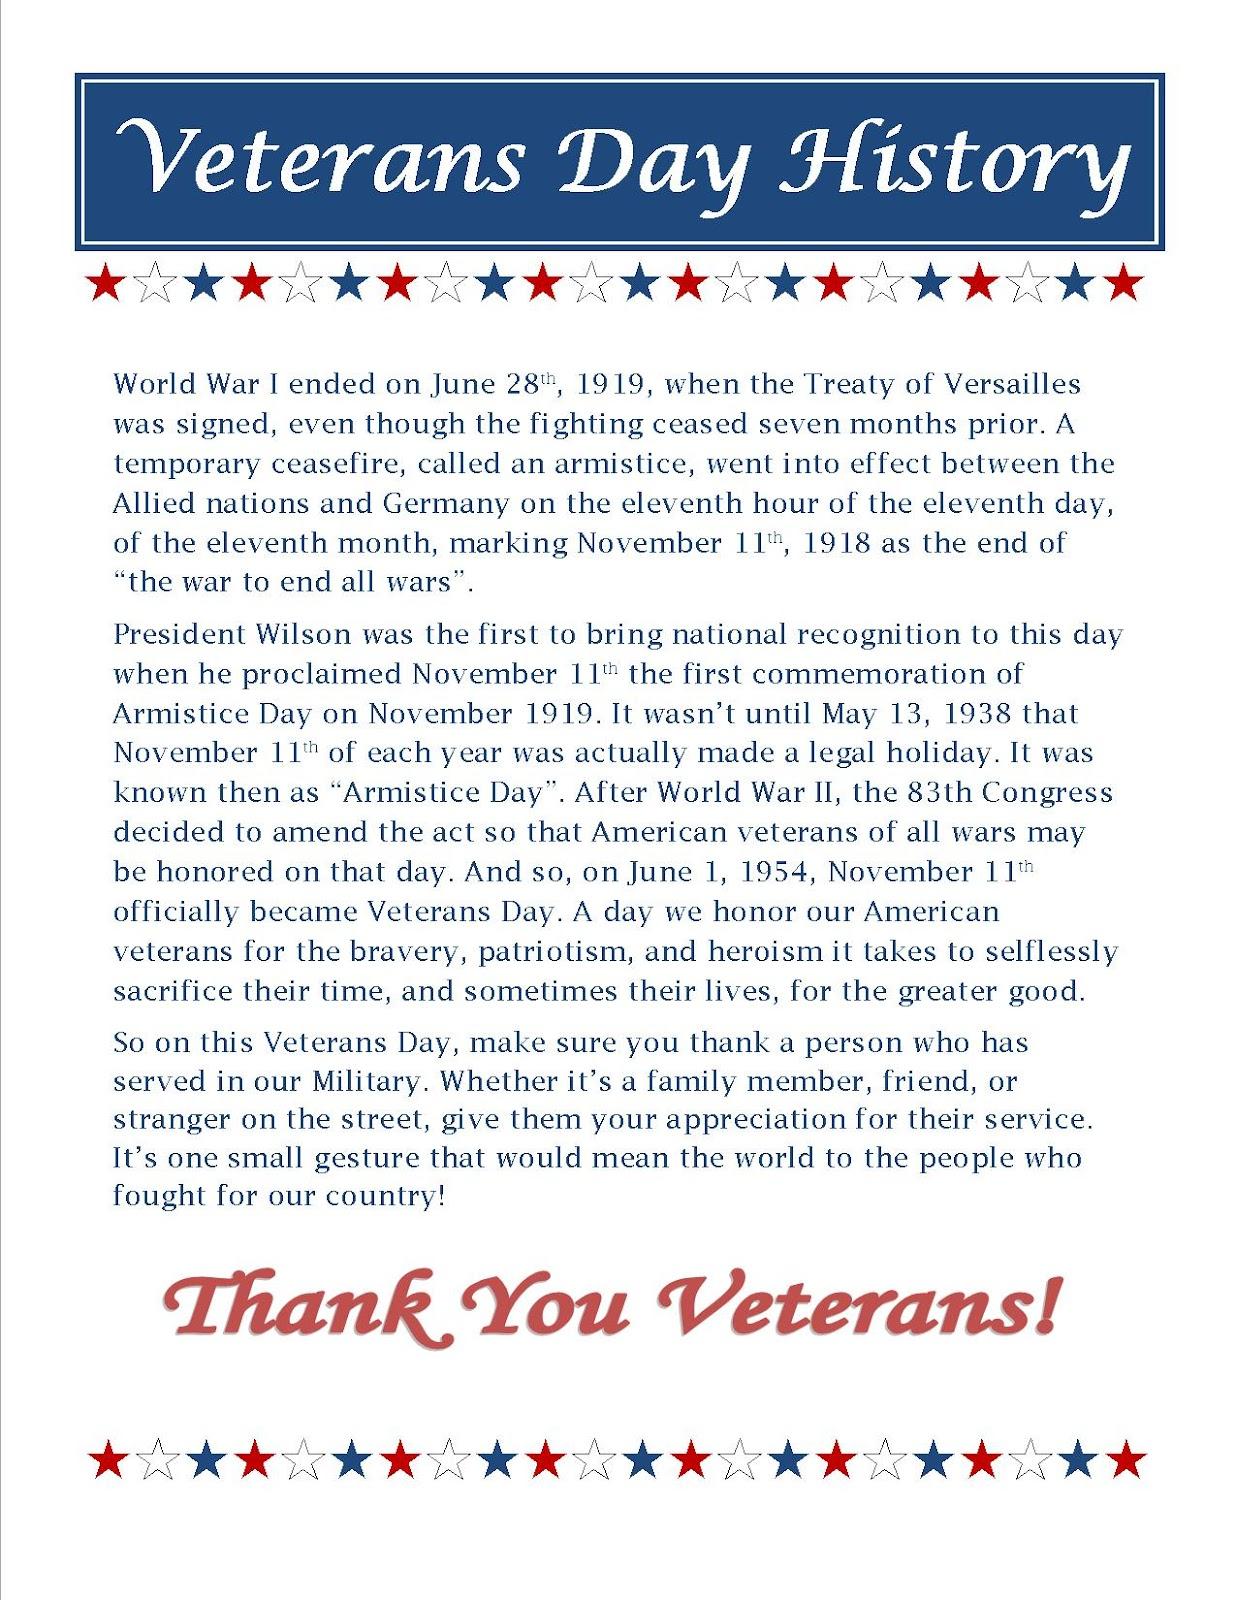 veteransdayhistory.jpg